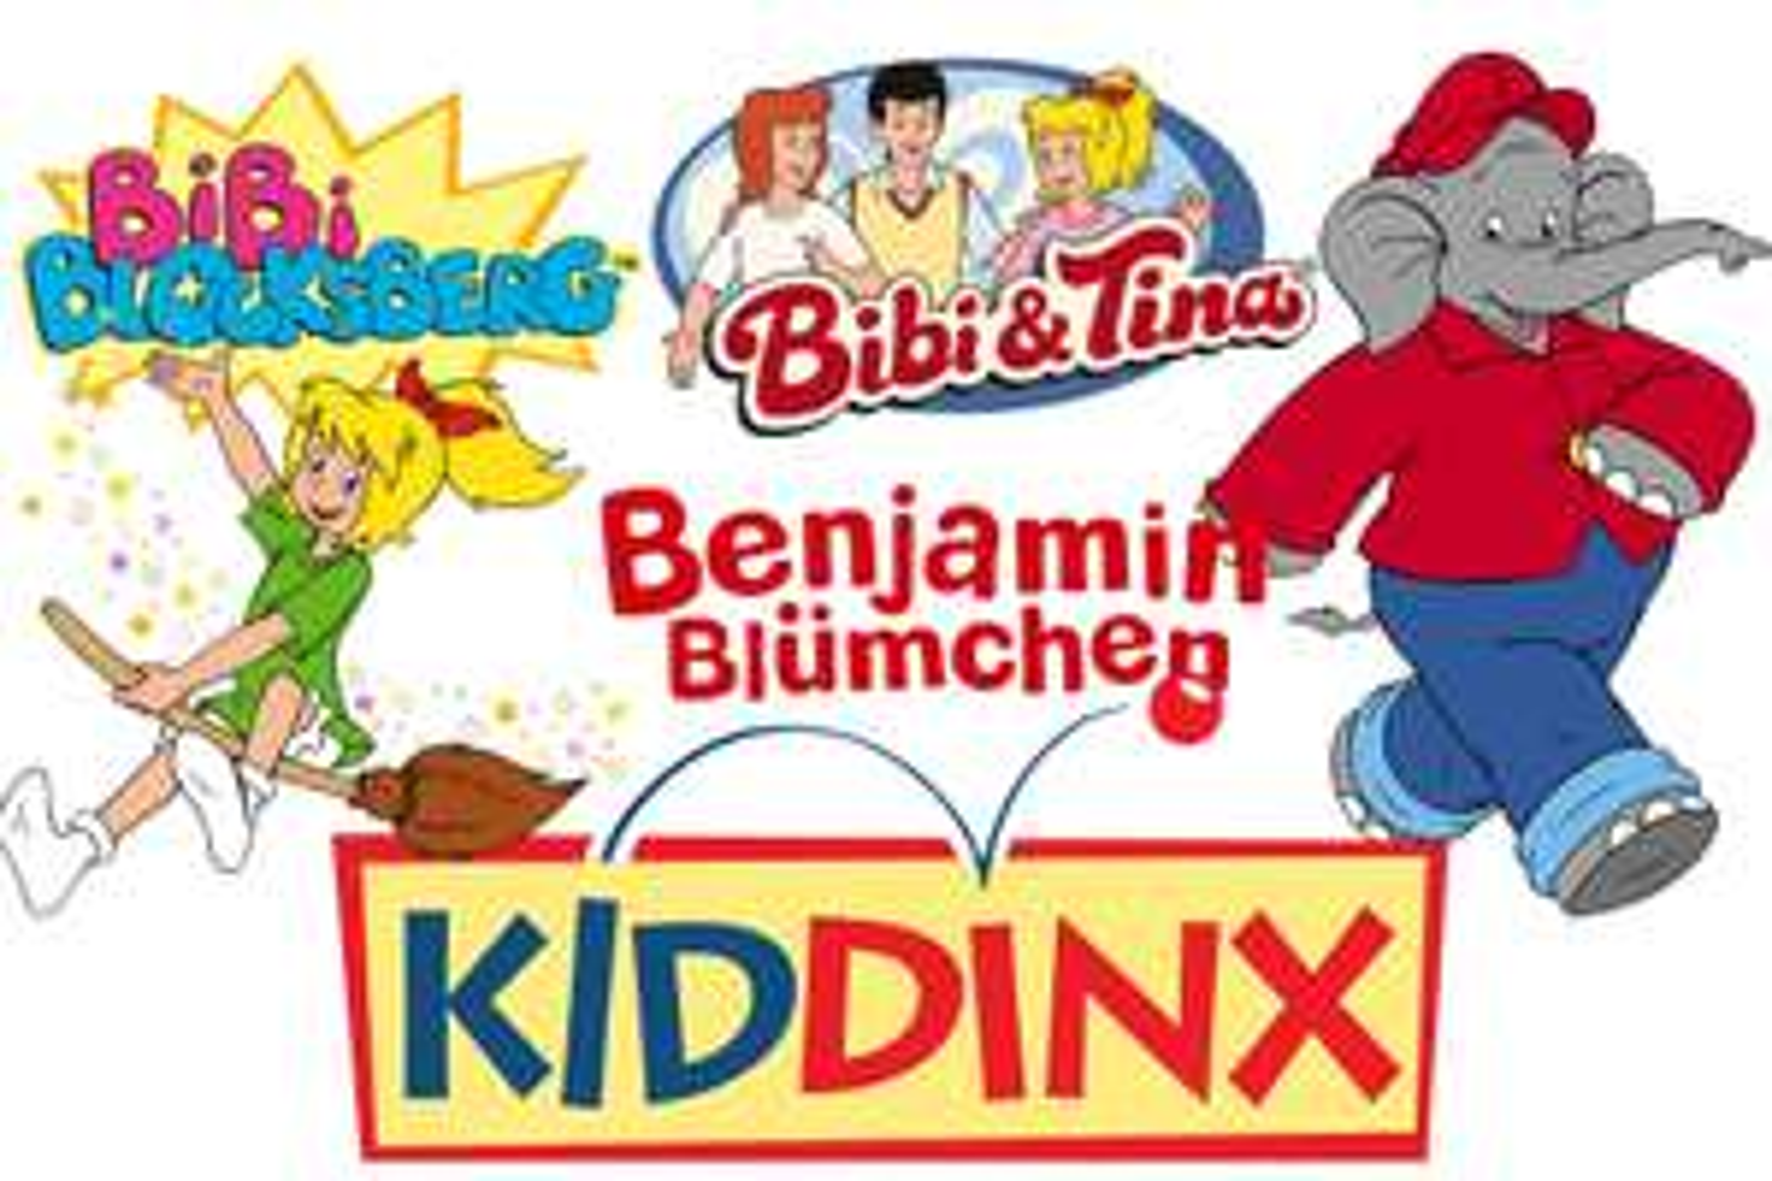 Oldschool - Kassetten (MC) von Bibi & Tina, Bibi Blocksberg und Benjamin Blümchen